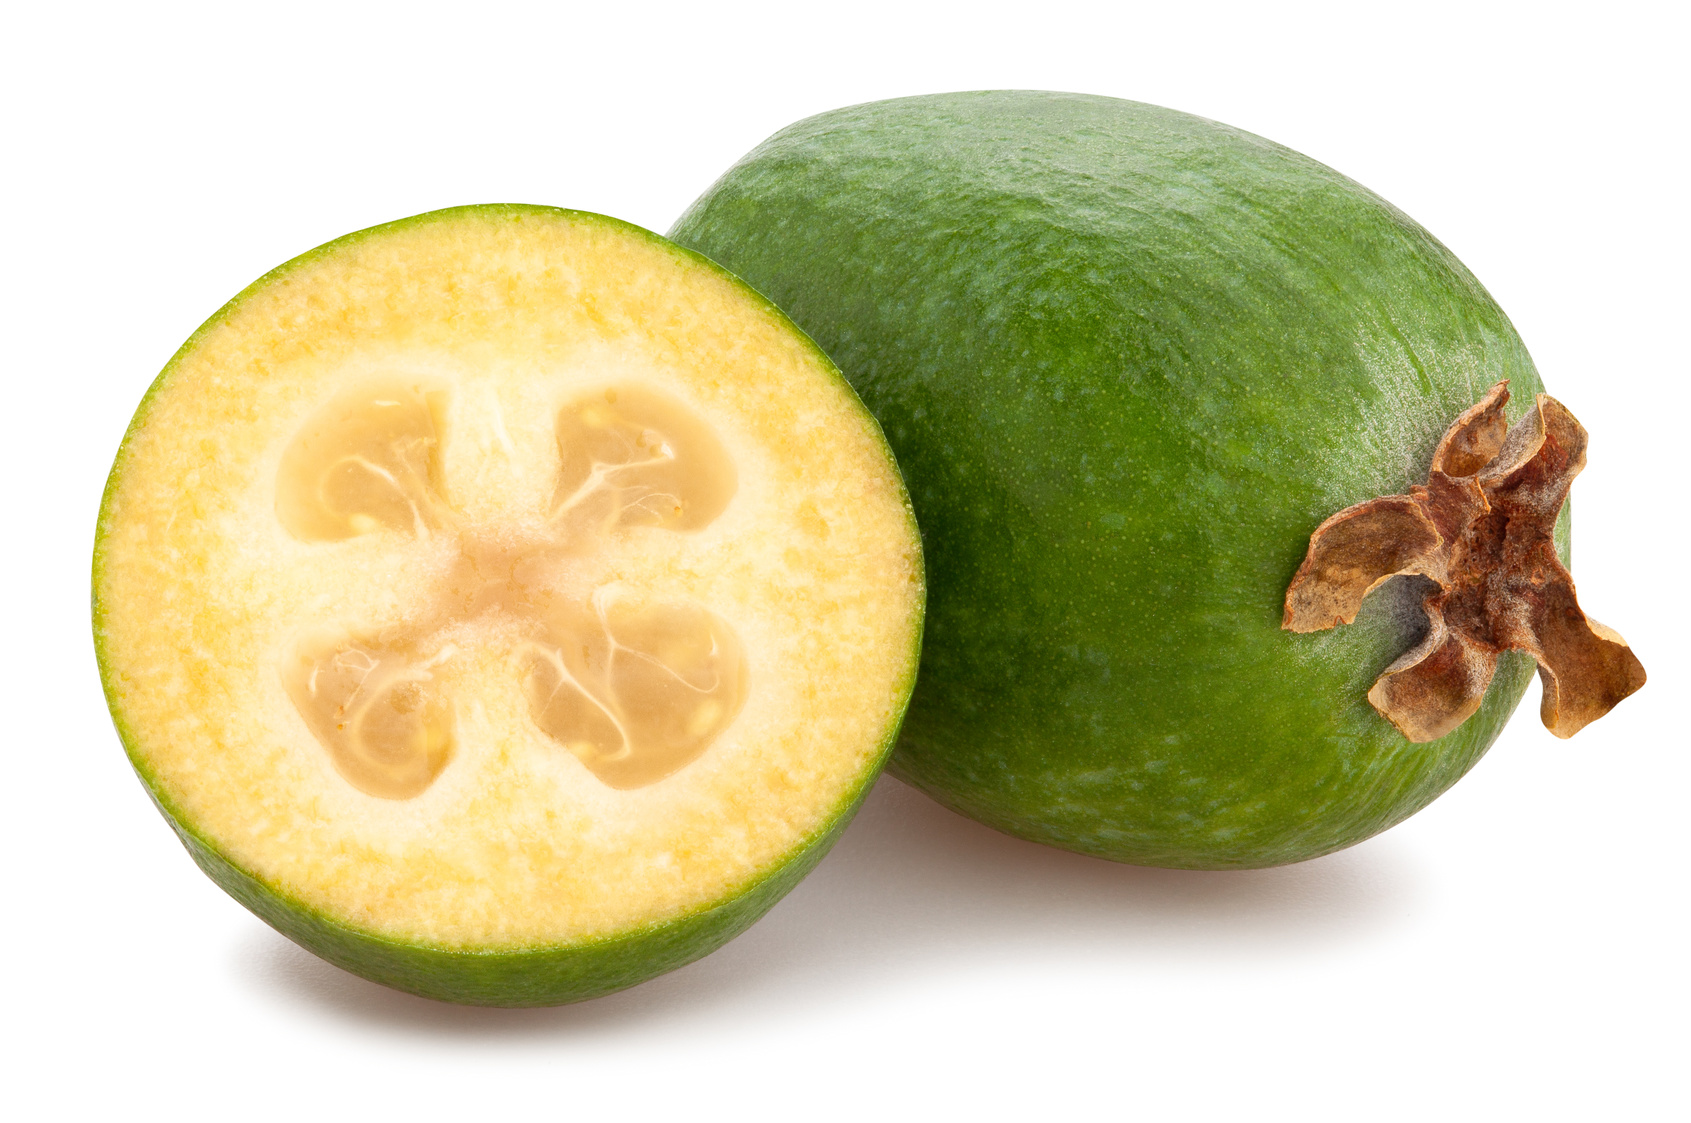 feijoa goyavier du brésil Goyavier de montevideo goyave-ananas fruit nutrition santé